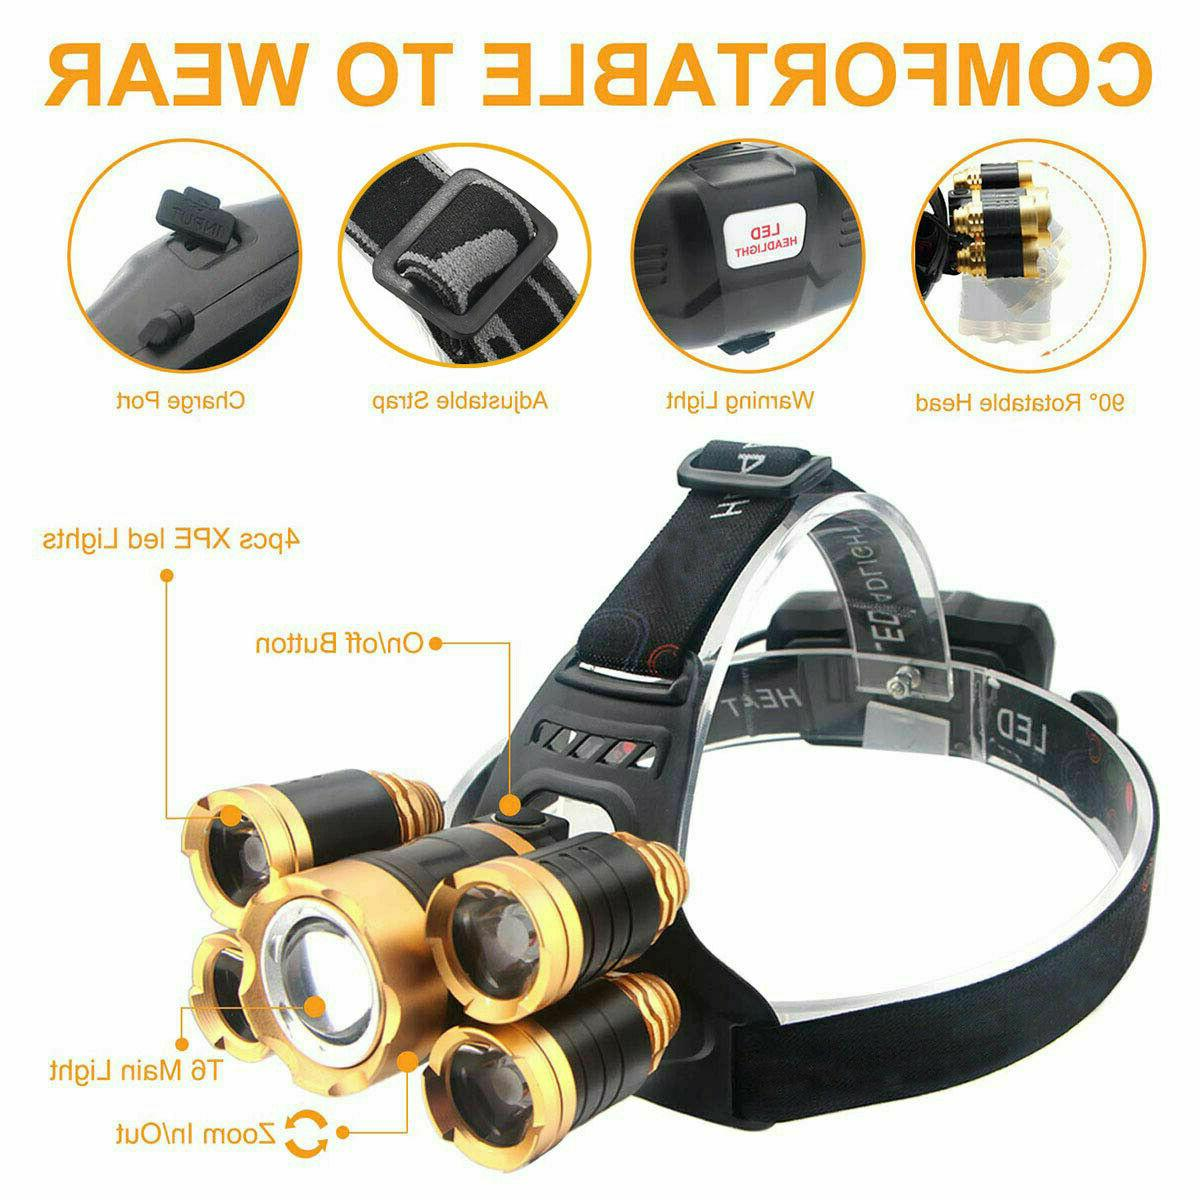 990000LM T6 LED Headlamp Flashlight Lamp USA